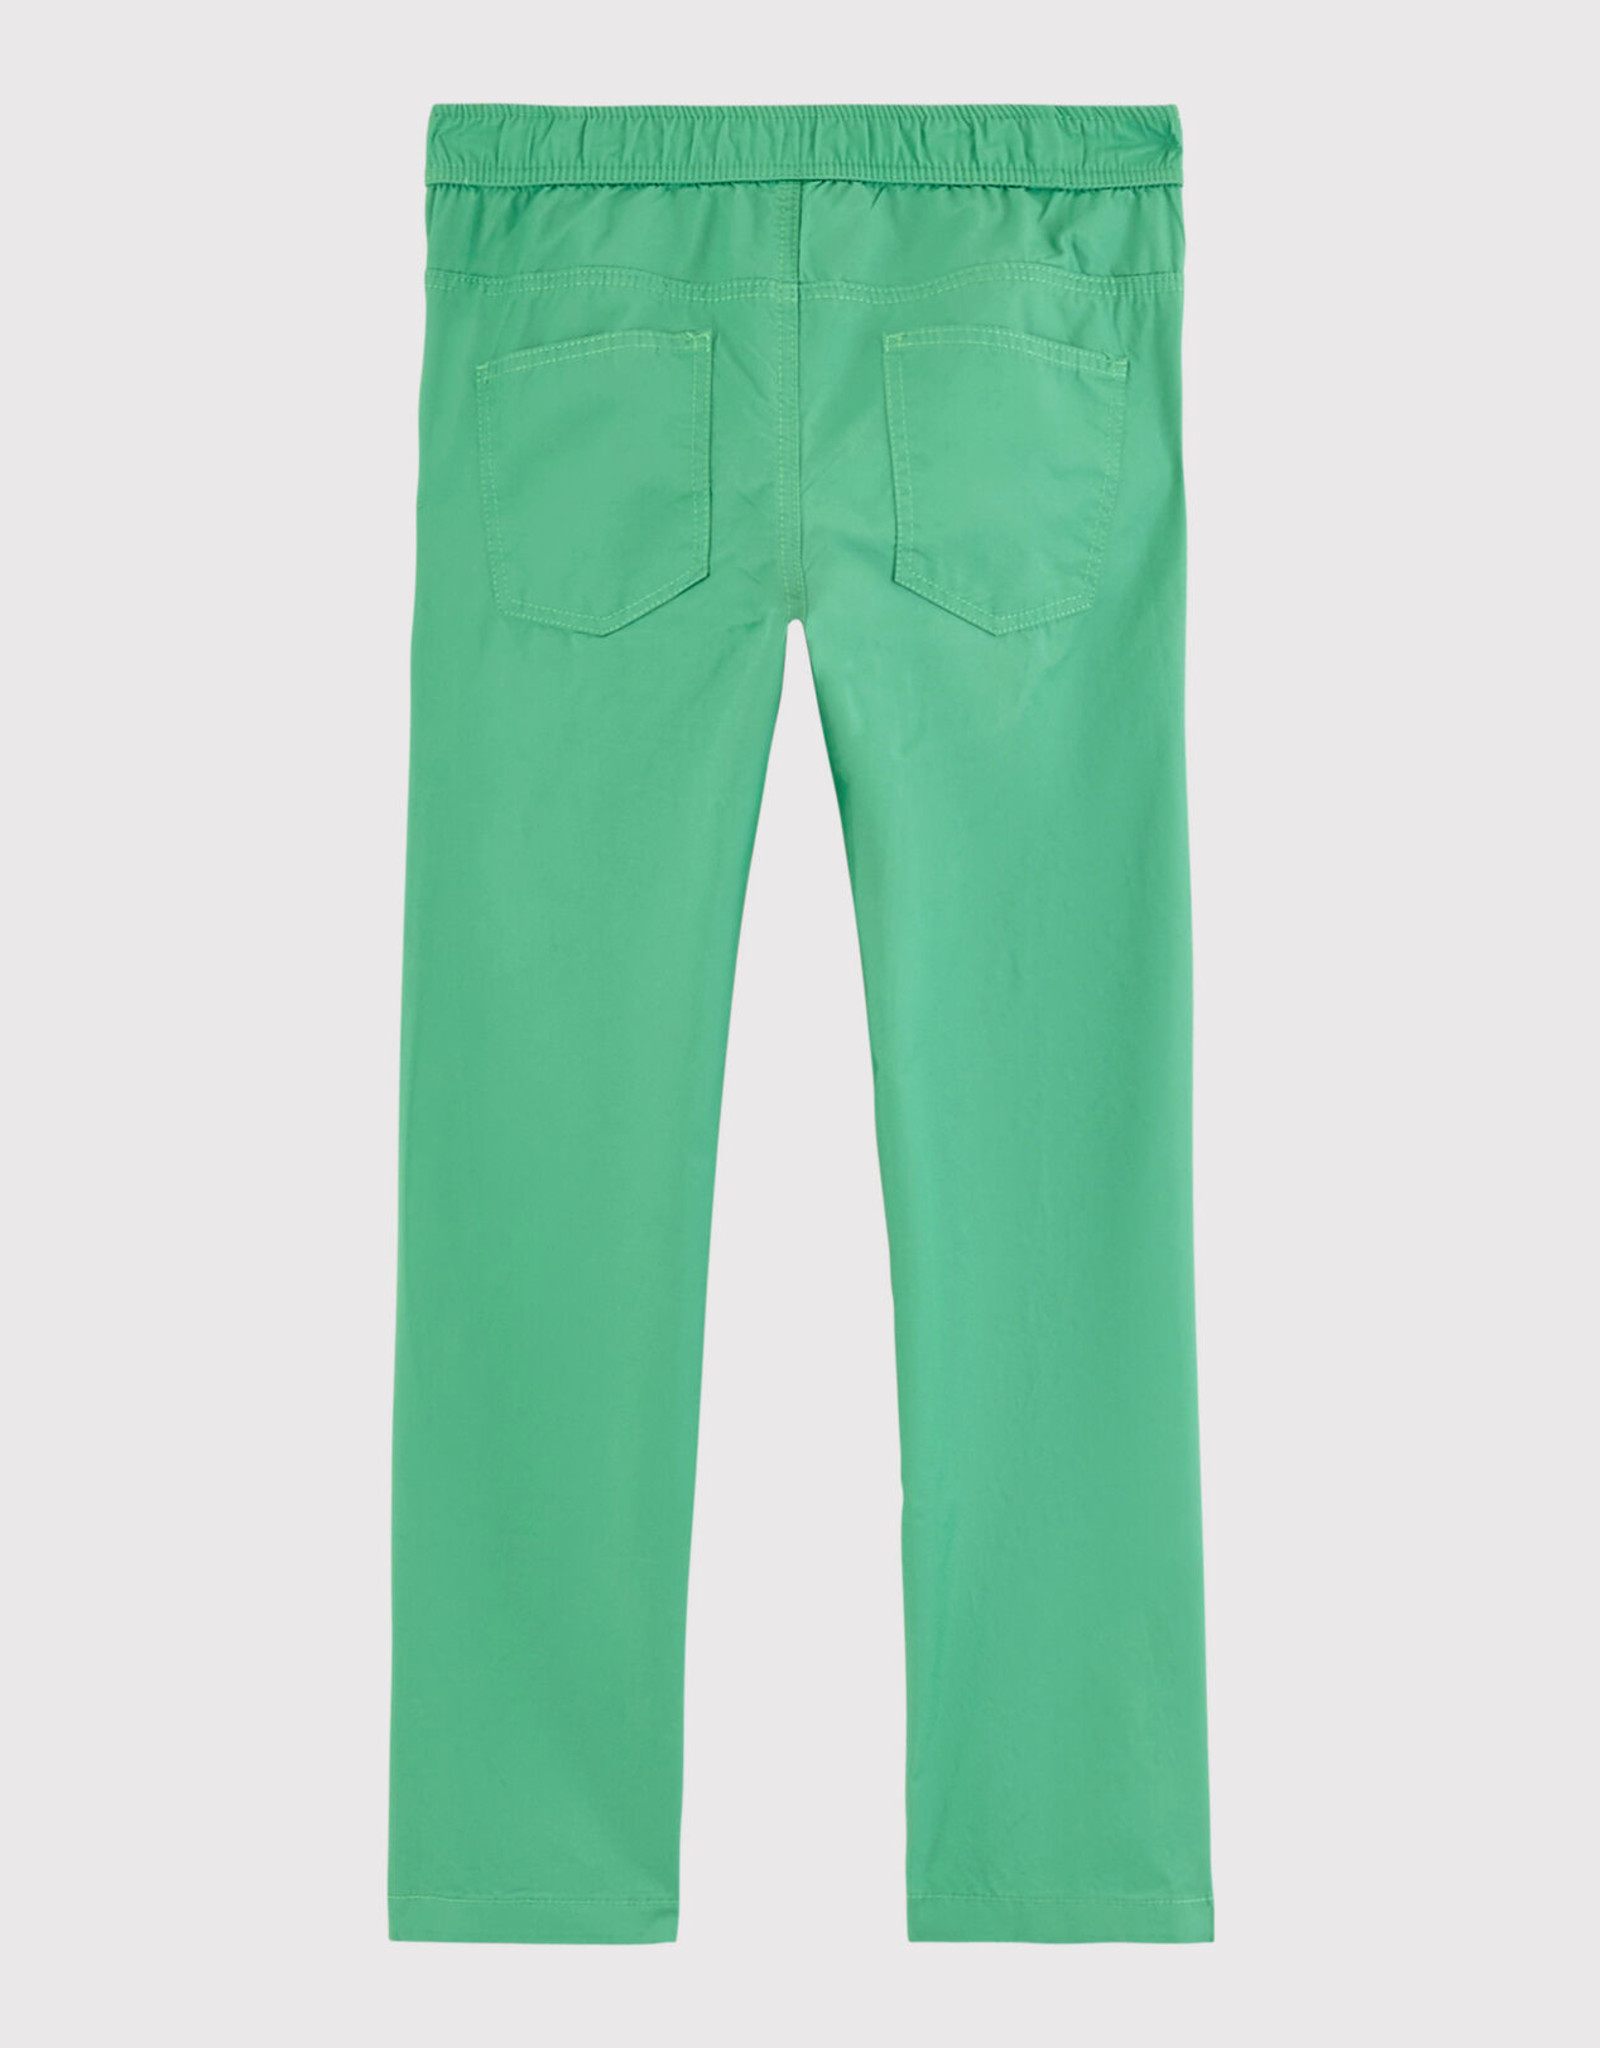 Petit Bateau Pants